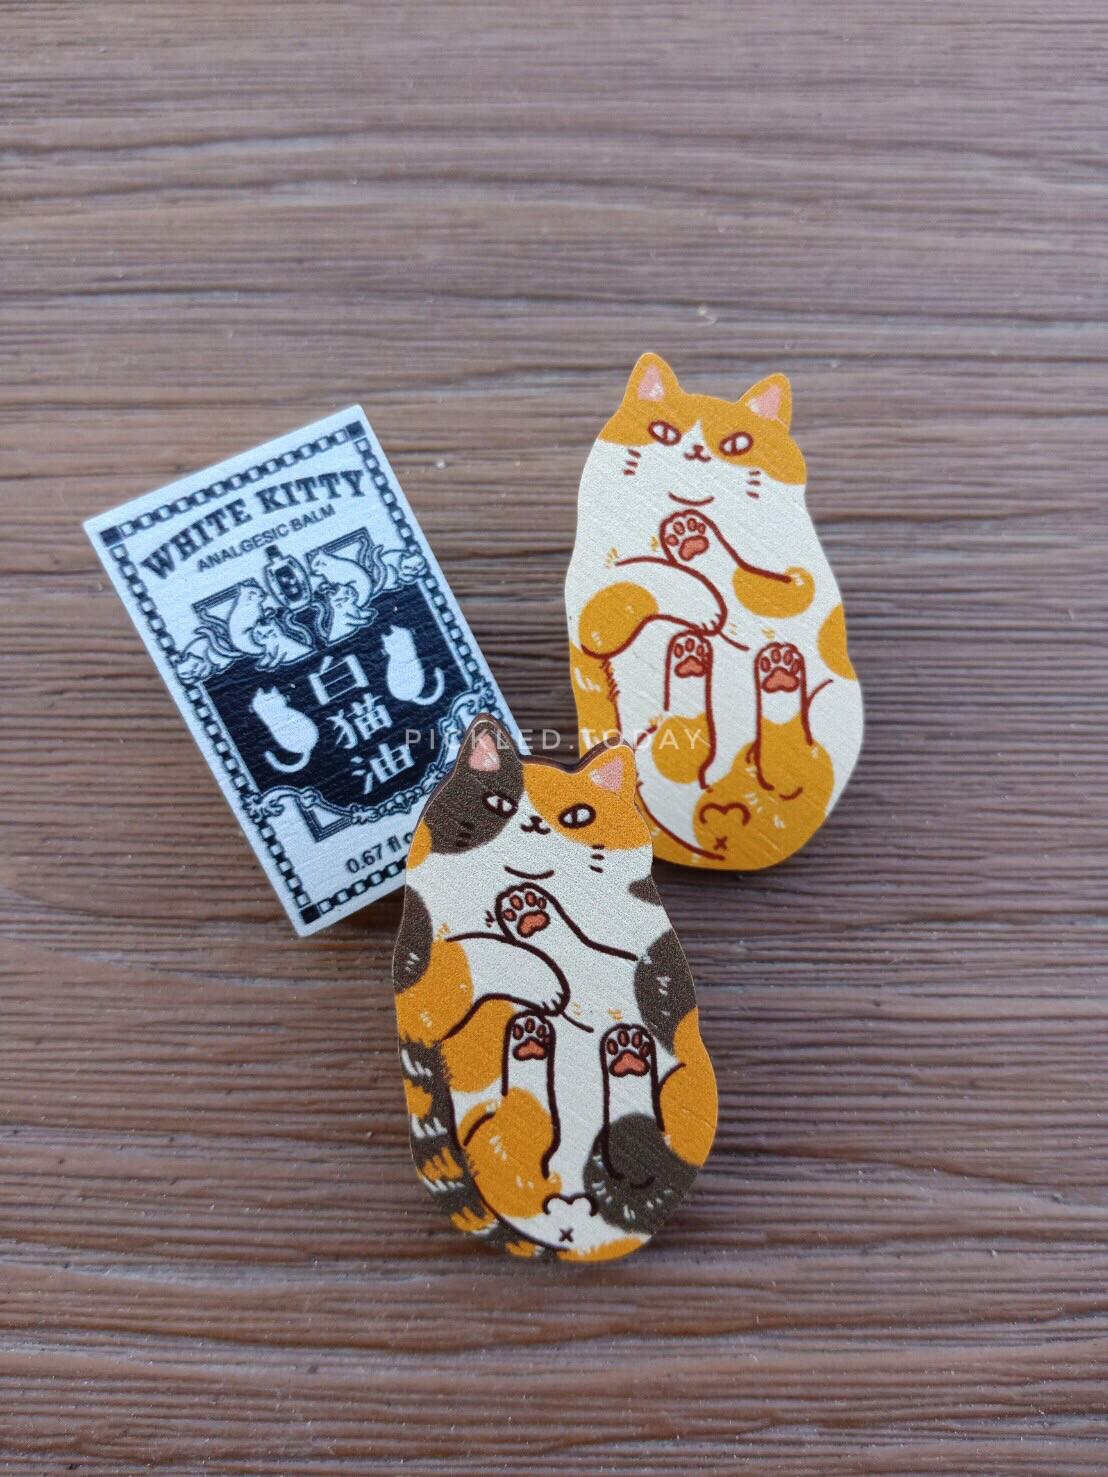 Wooden Pins - Cats